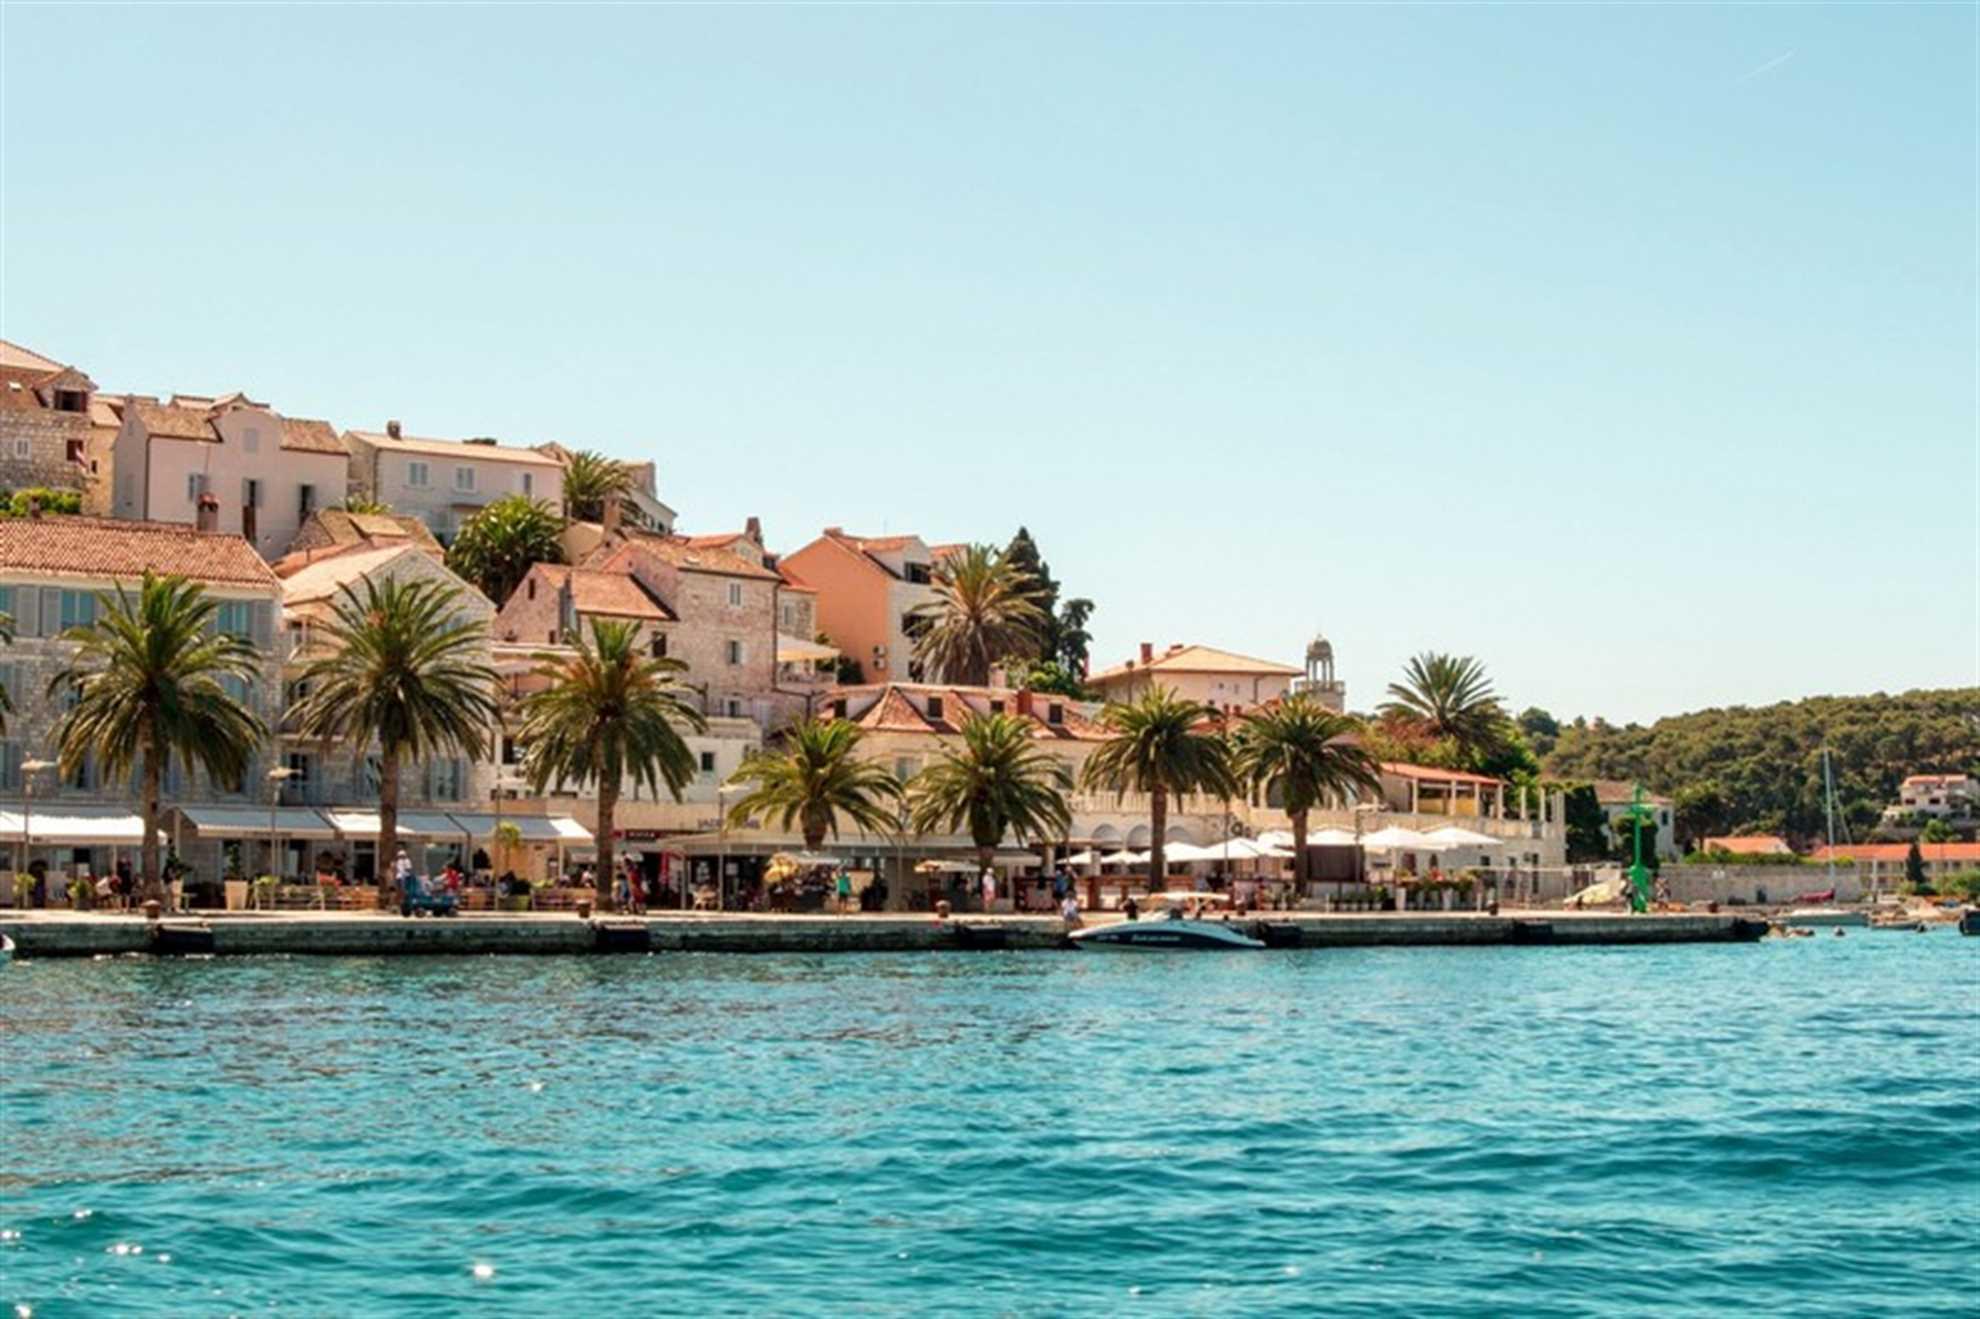 Hvar Town, Waterfront Promenade